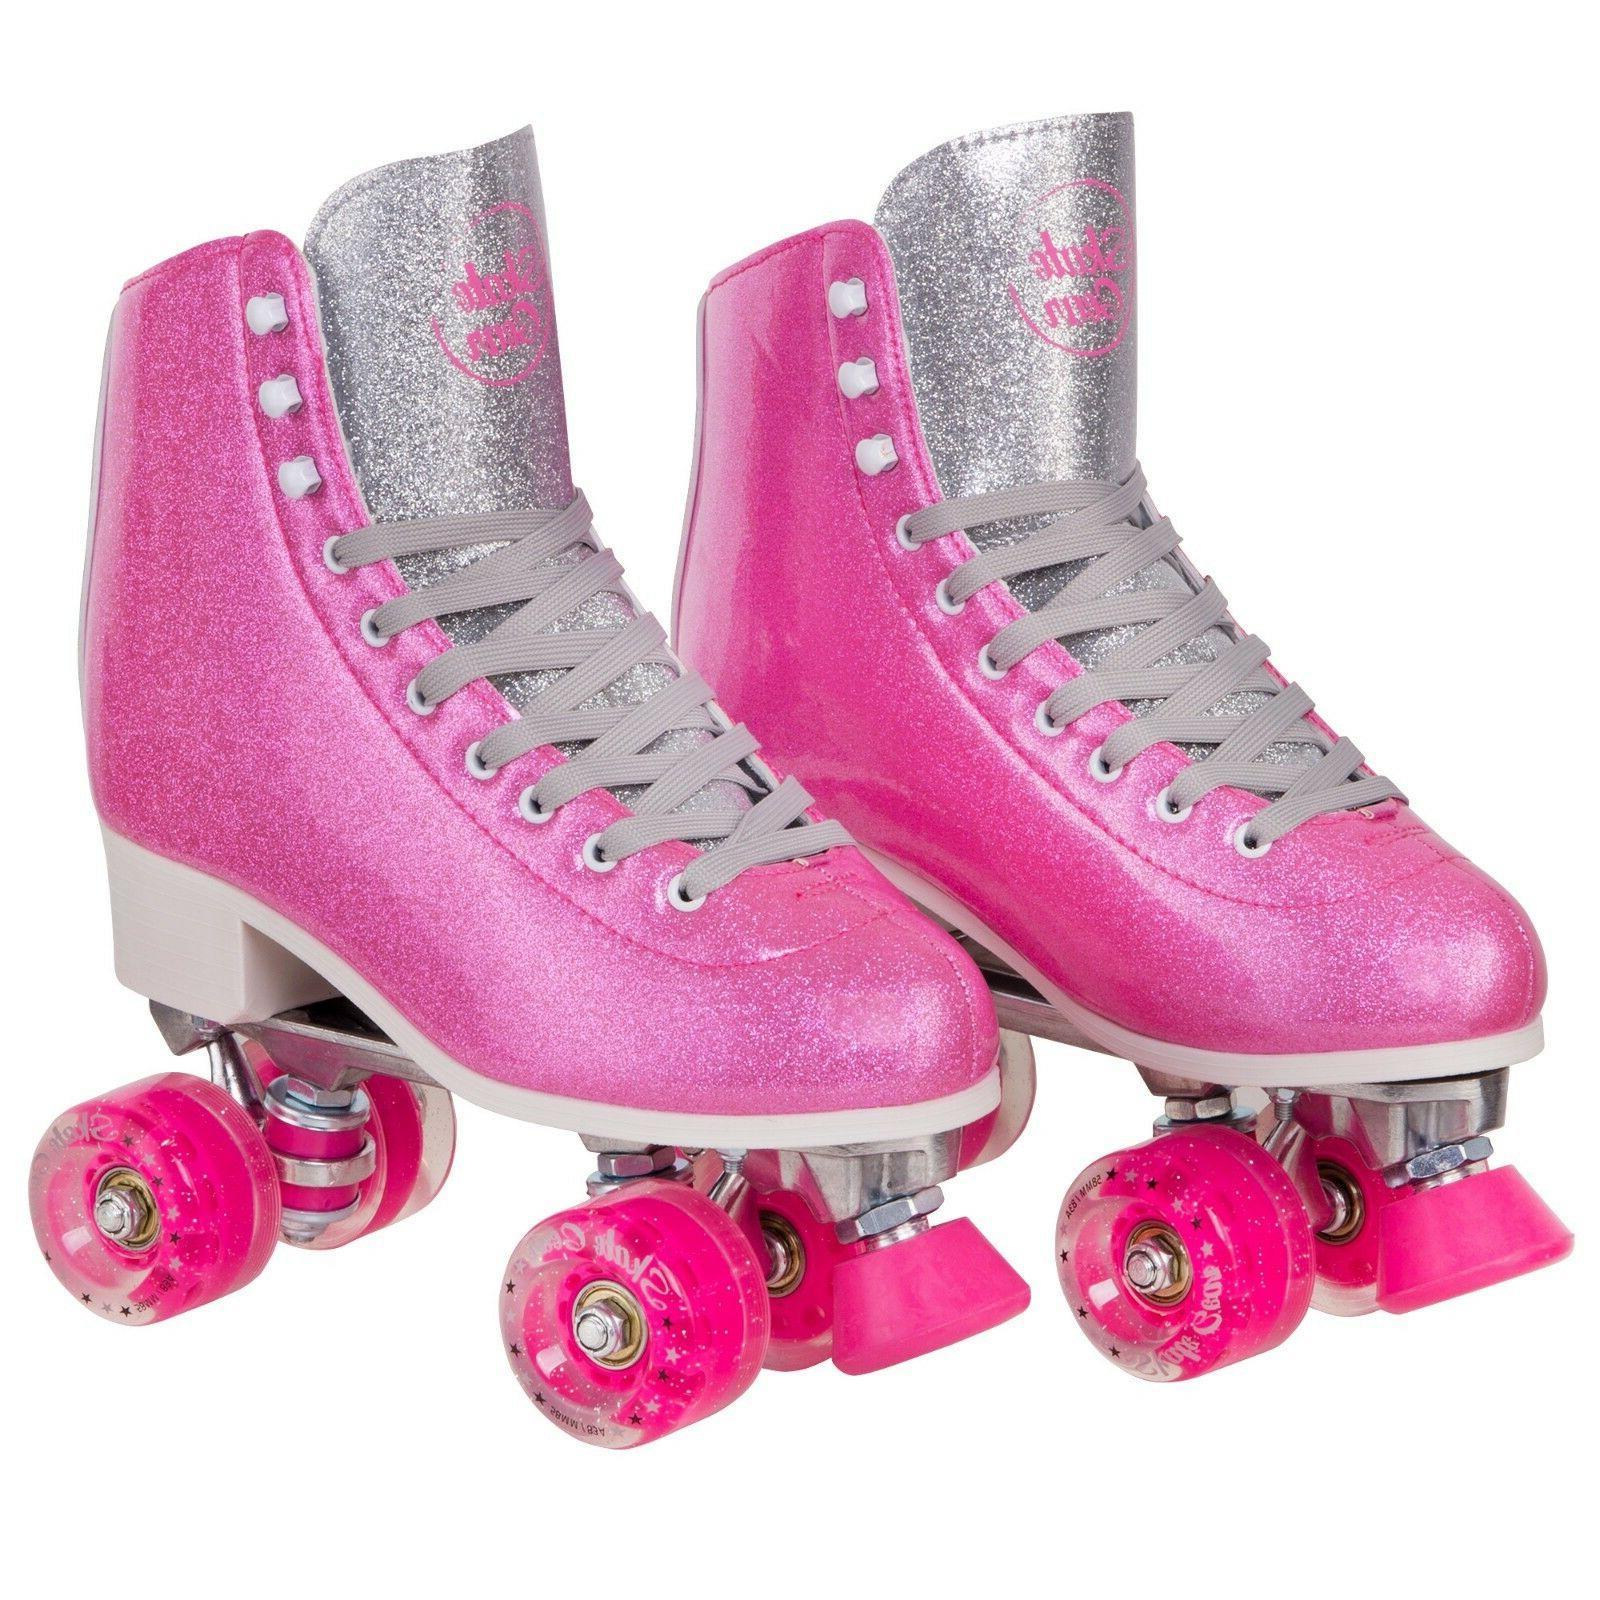 Skate Skates Kids & Adults Summer Ride